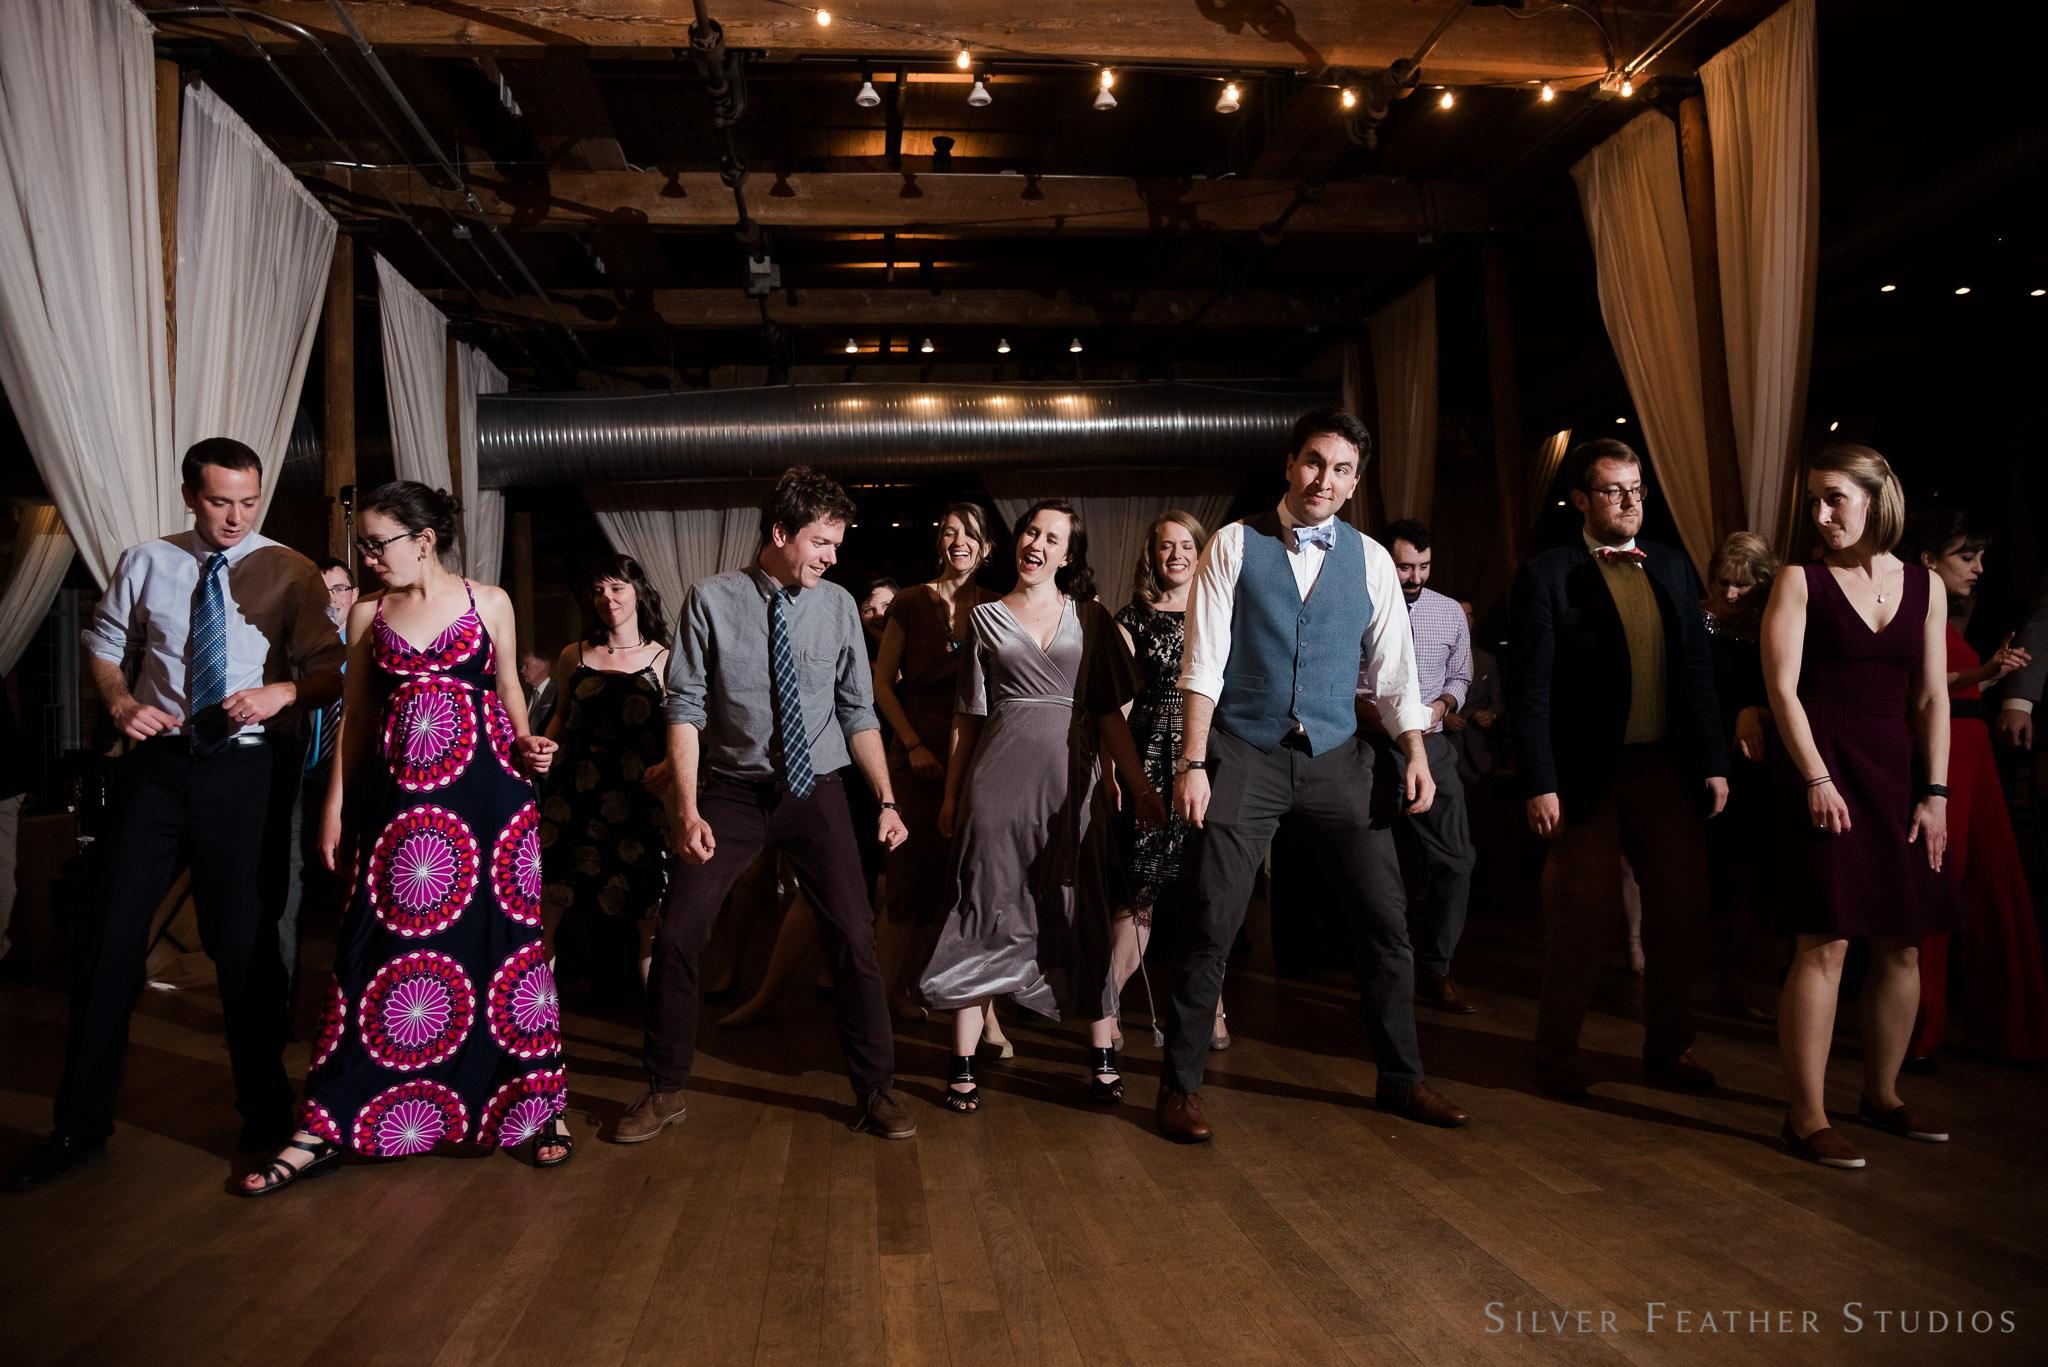 cotton-room-wedding-photography-067.jpg